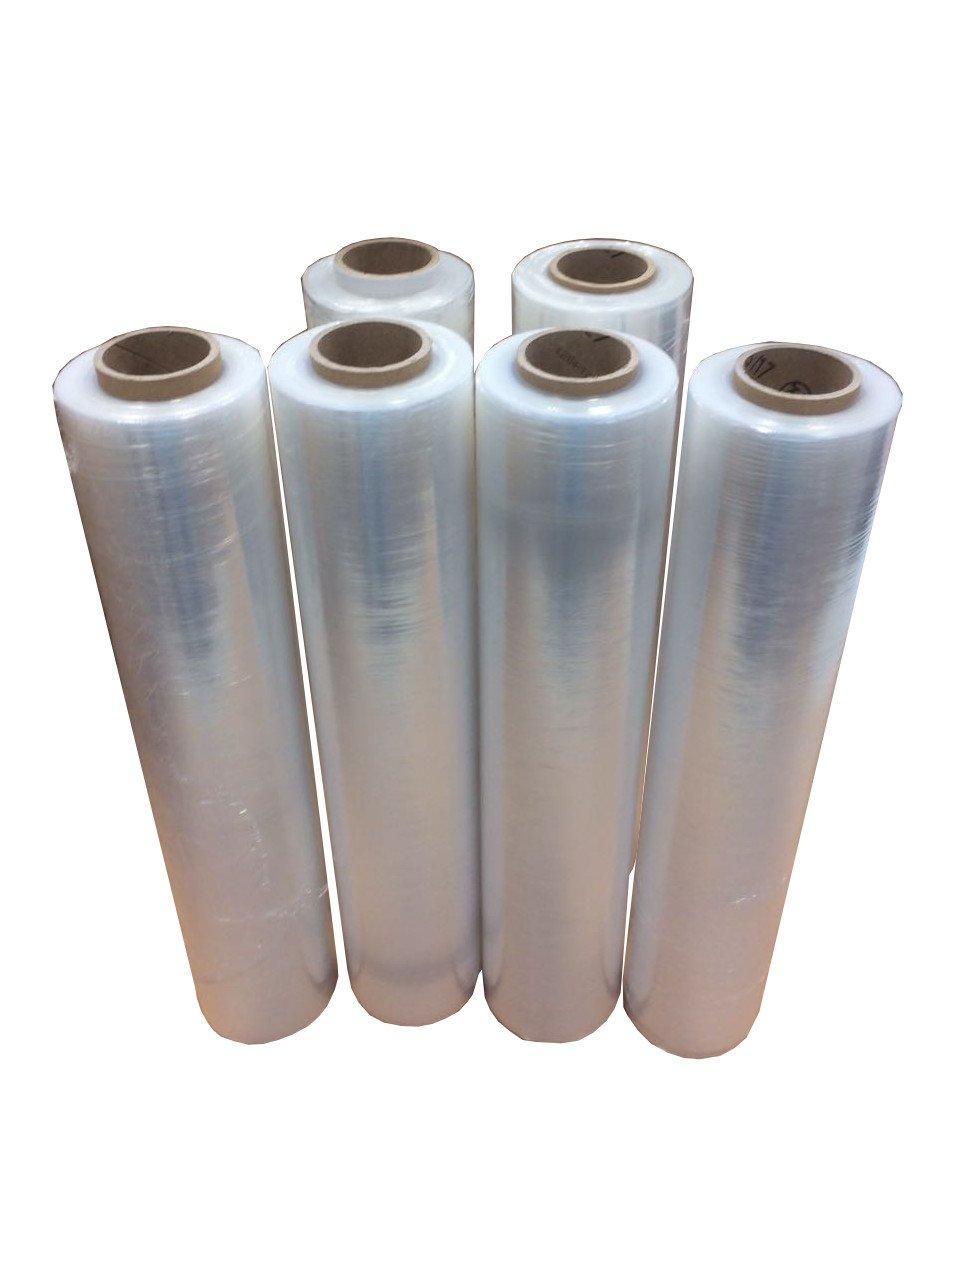 6 X Pellicola estensibile trasparente pellicola elasticizzata stretch Pellicola 500 mm 1, 5 kg 5kg Stretchfol